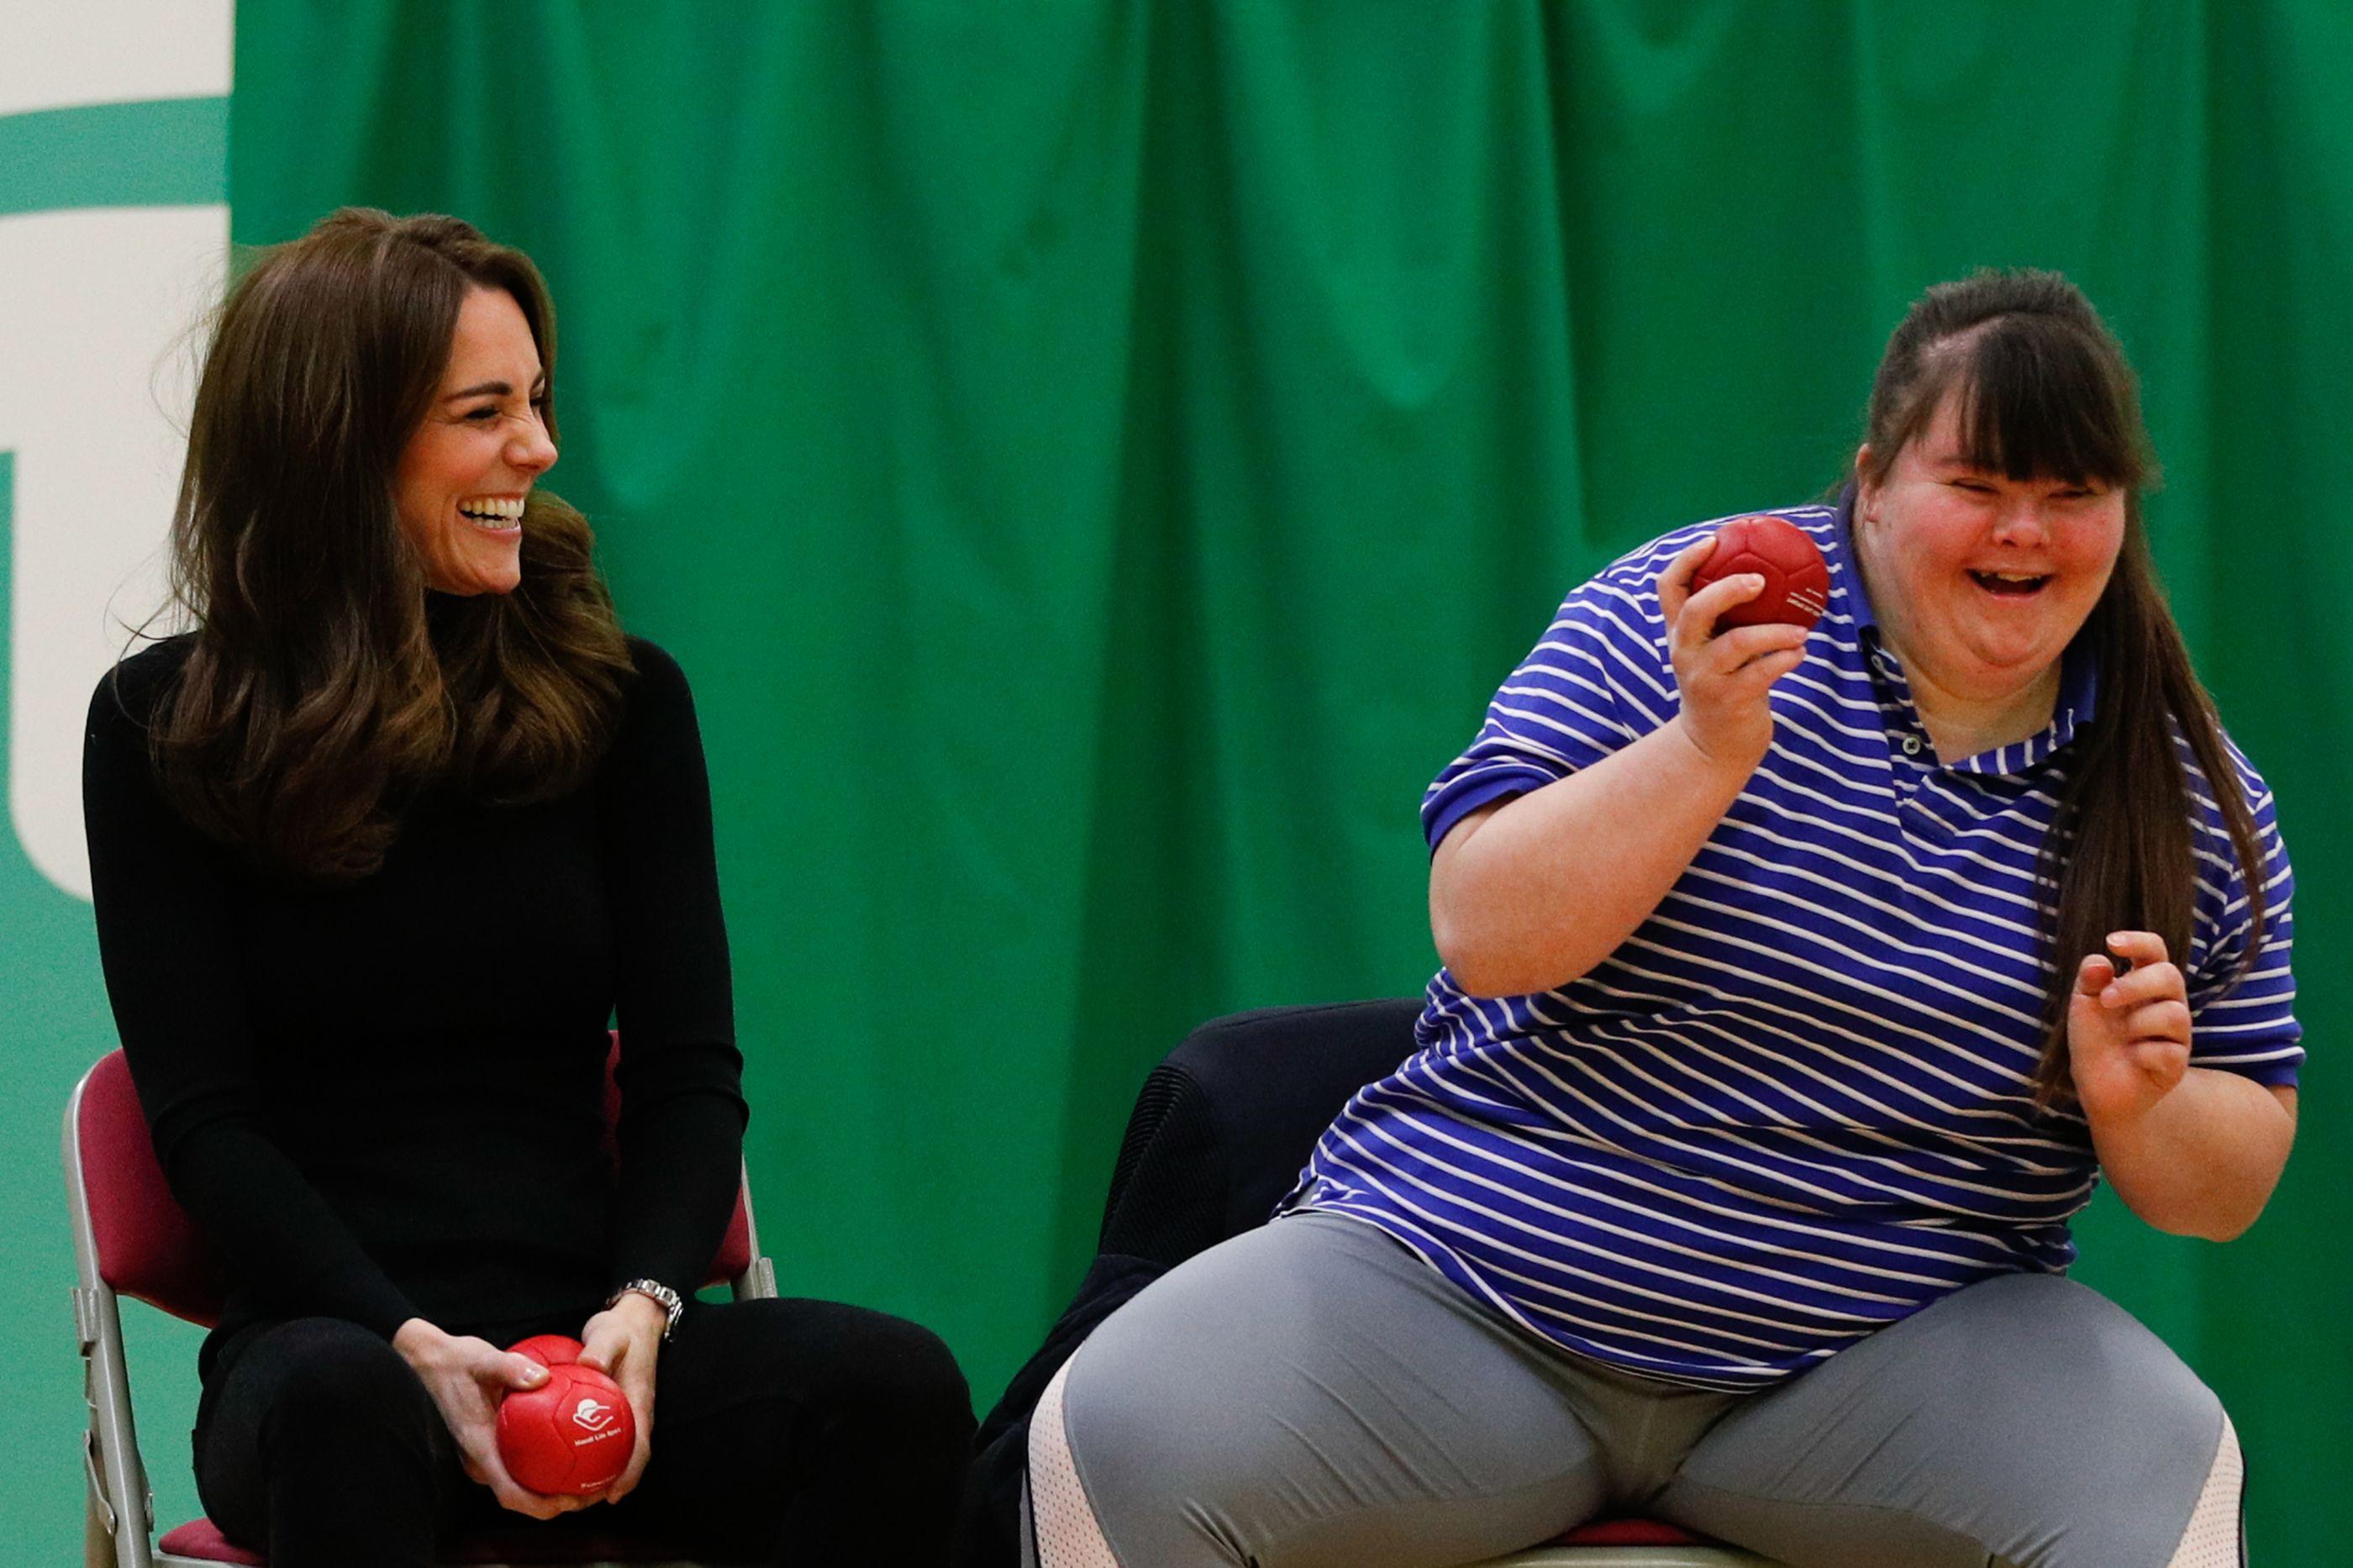 William e Kate Middleton sorridentes em compromisso real